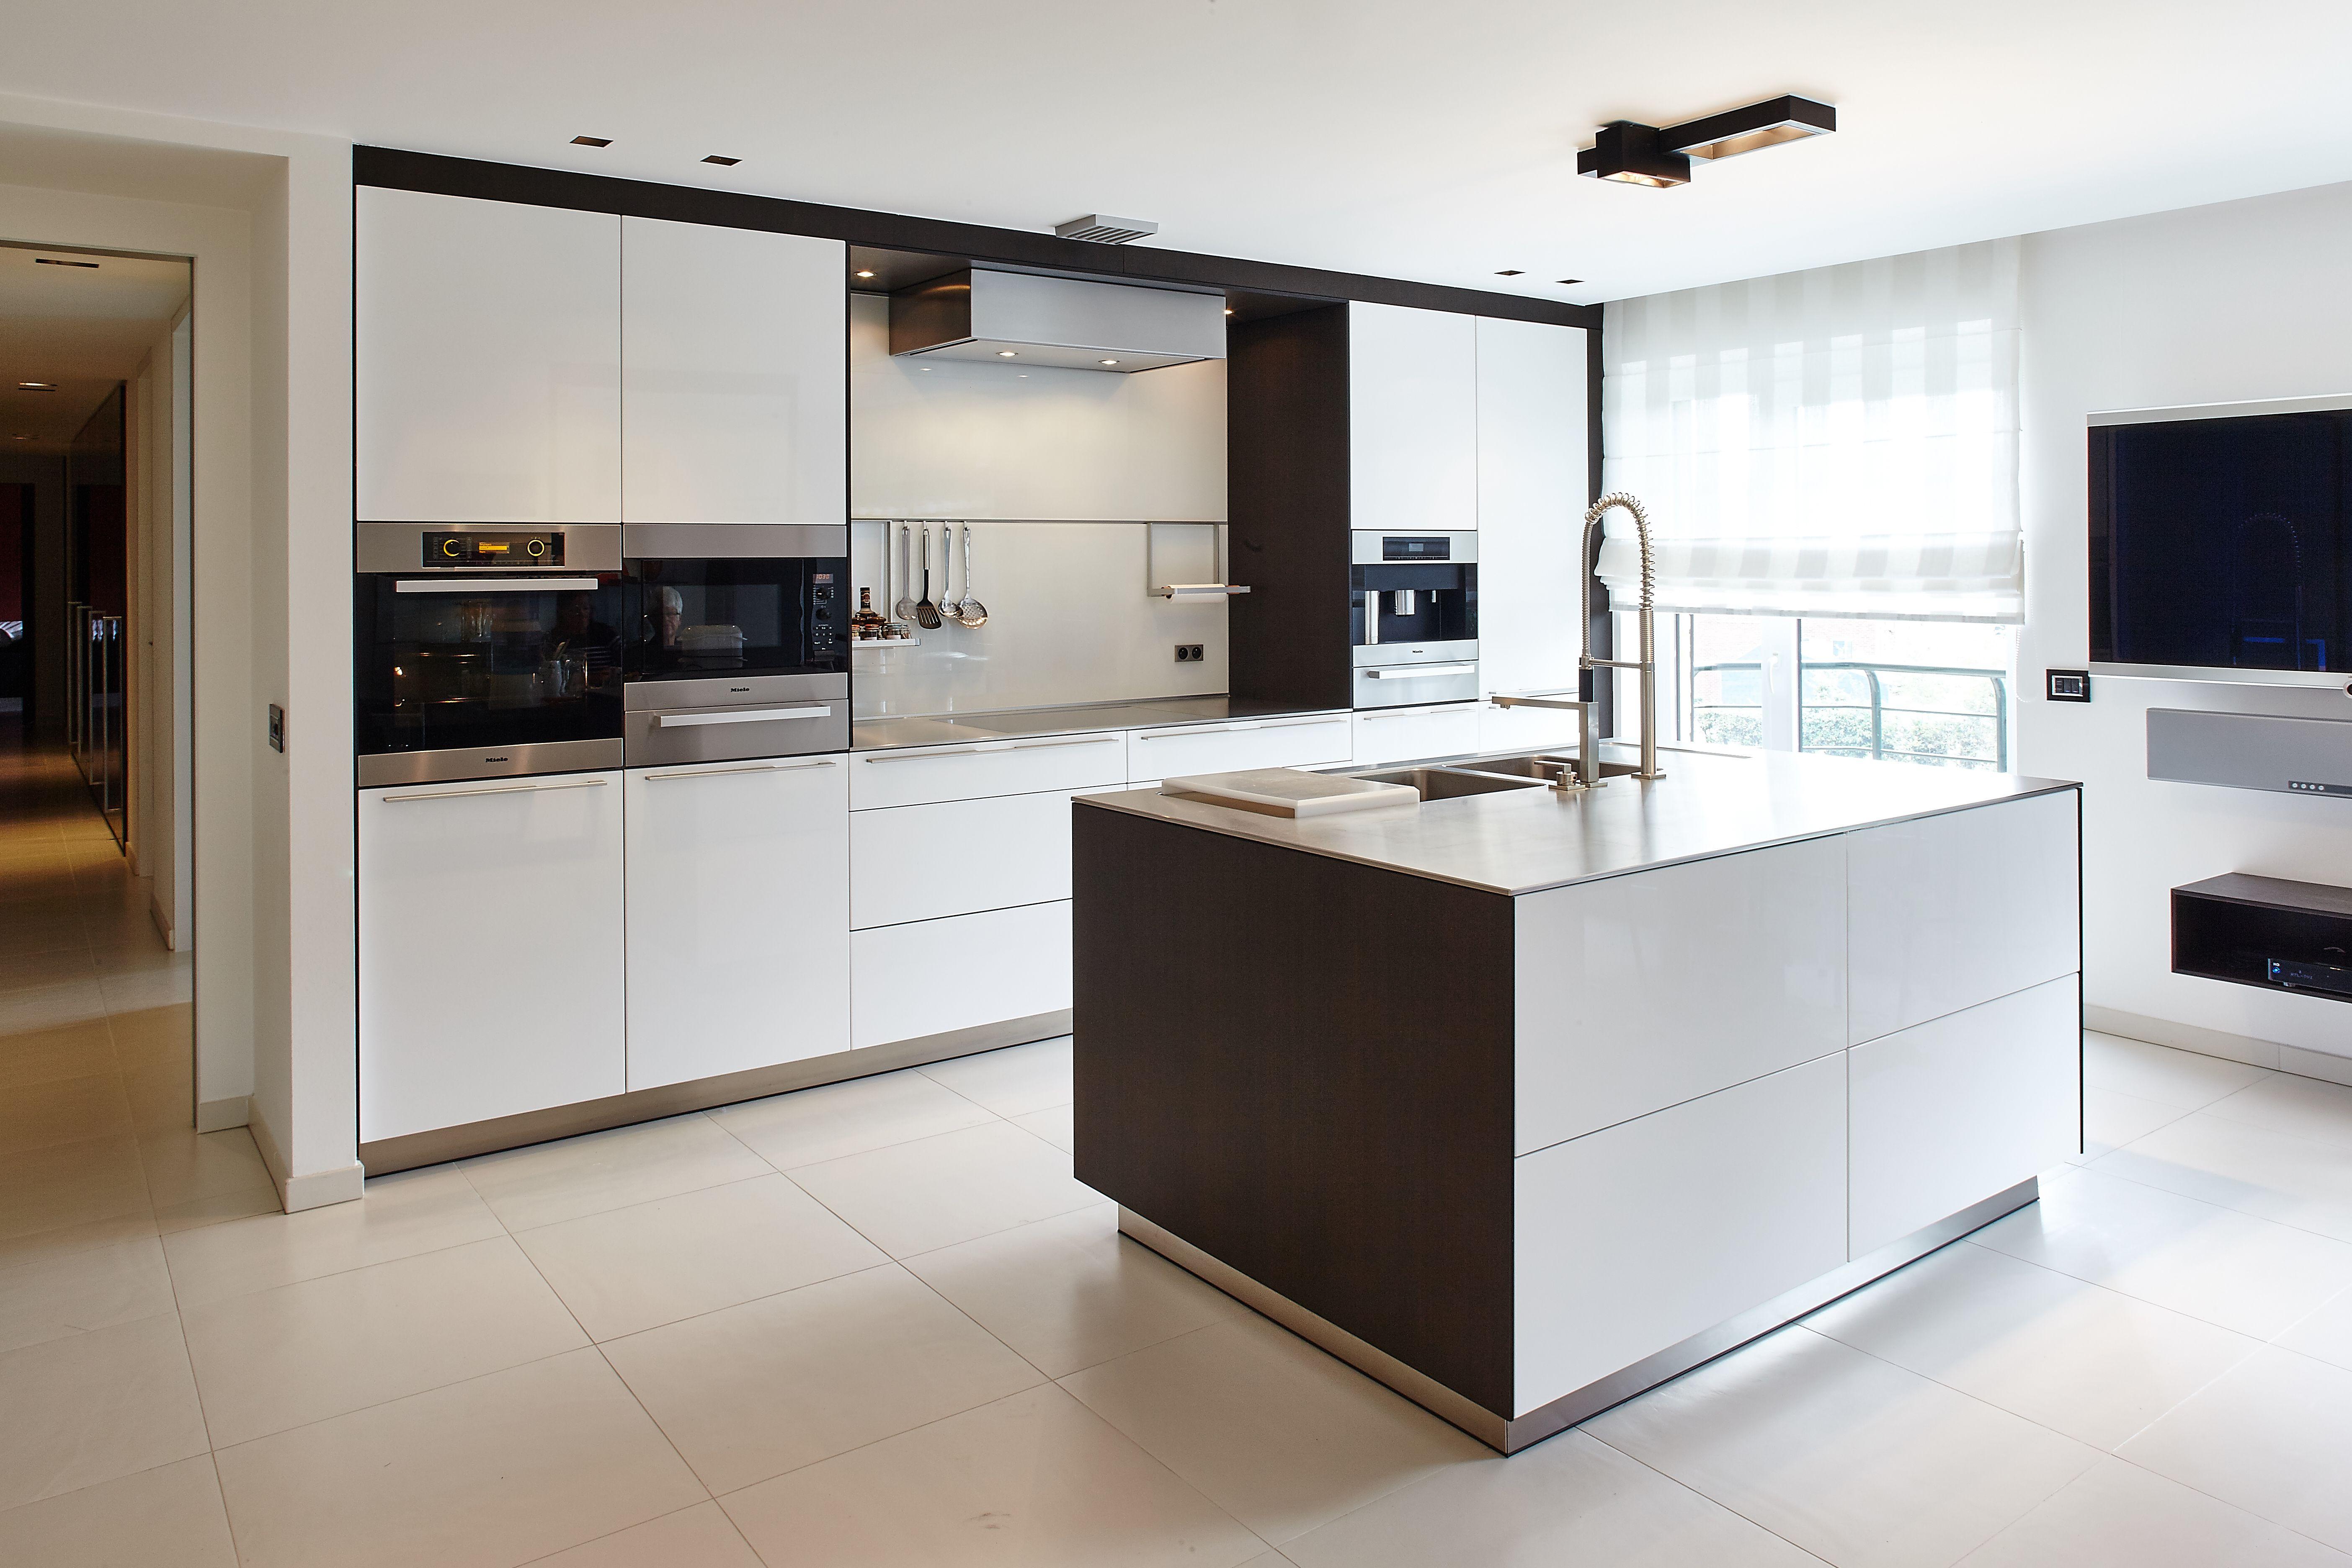 Keuken Rvs Wandpanelen : Bulthaup b3 hoogglanslak wit fineer eik zwartbruin werkblad rvs